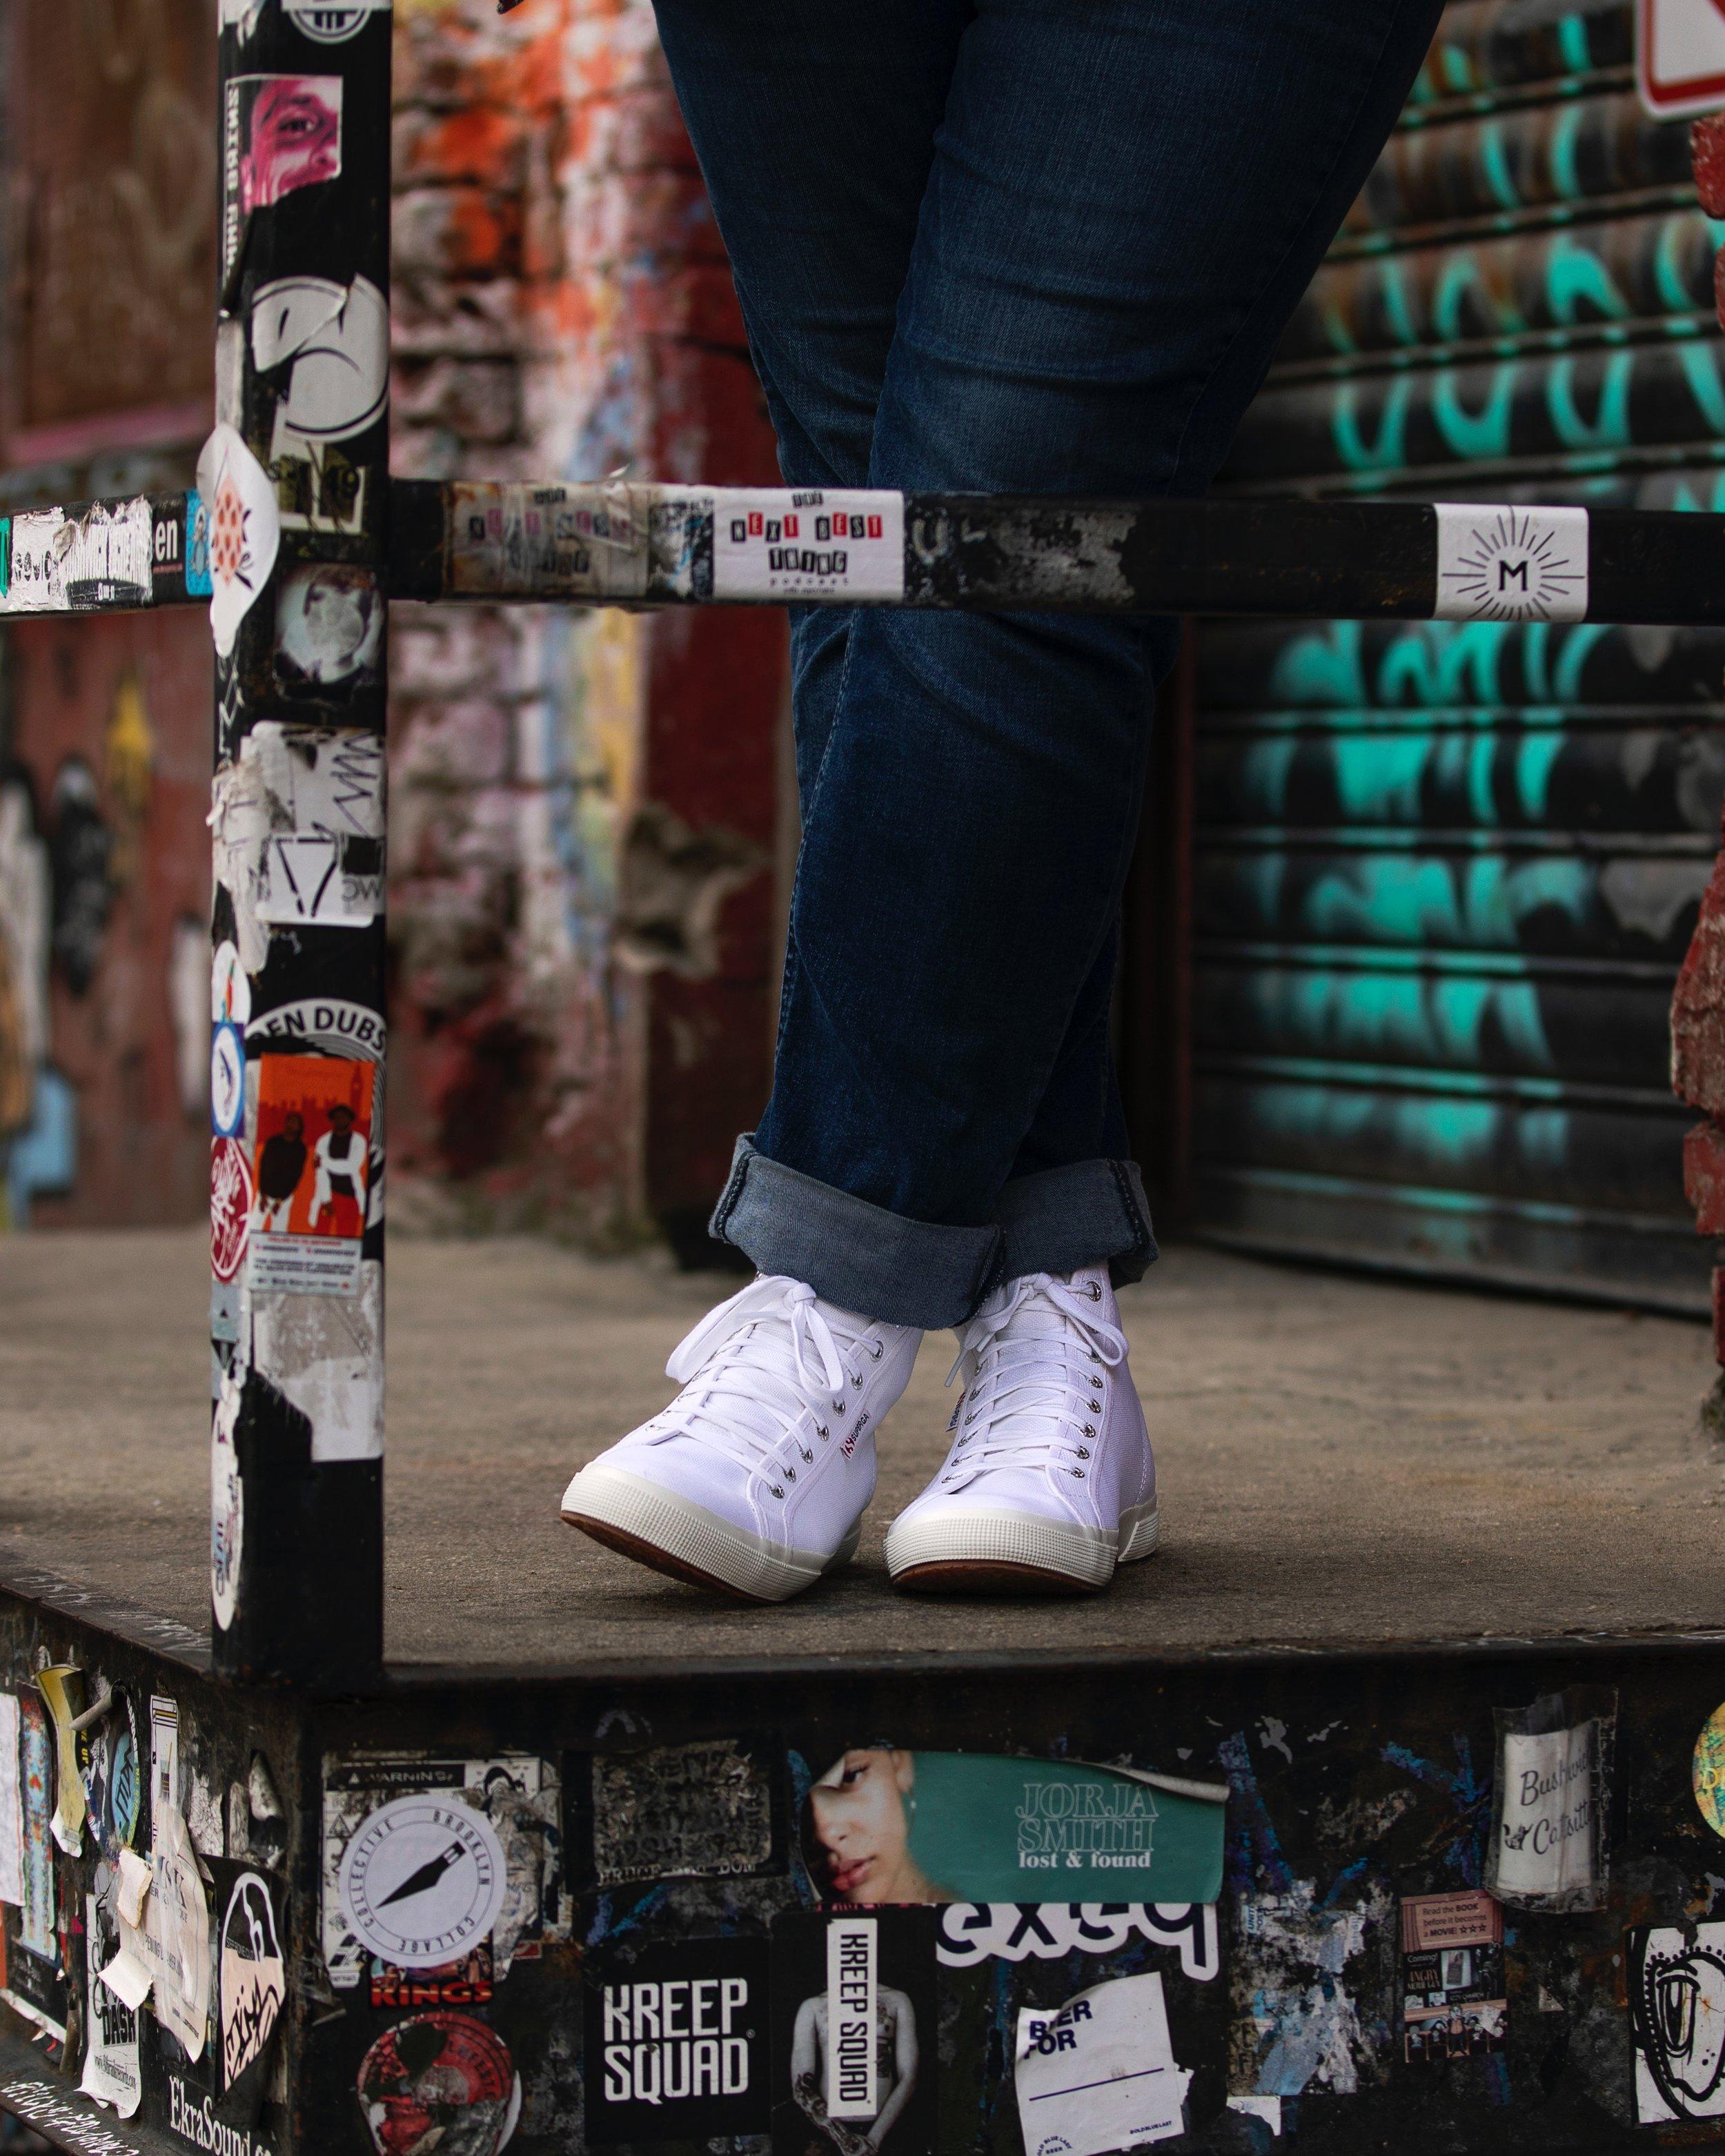 Superga Men's Sneakers 01 - Jimmy Larkin